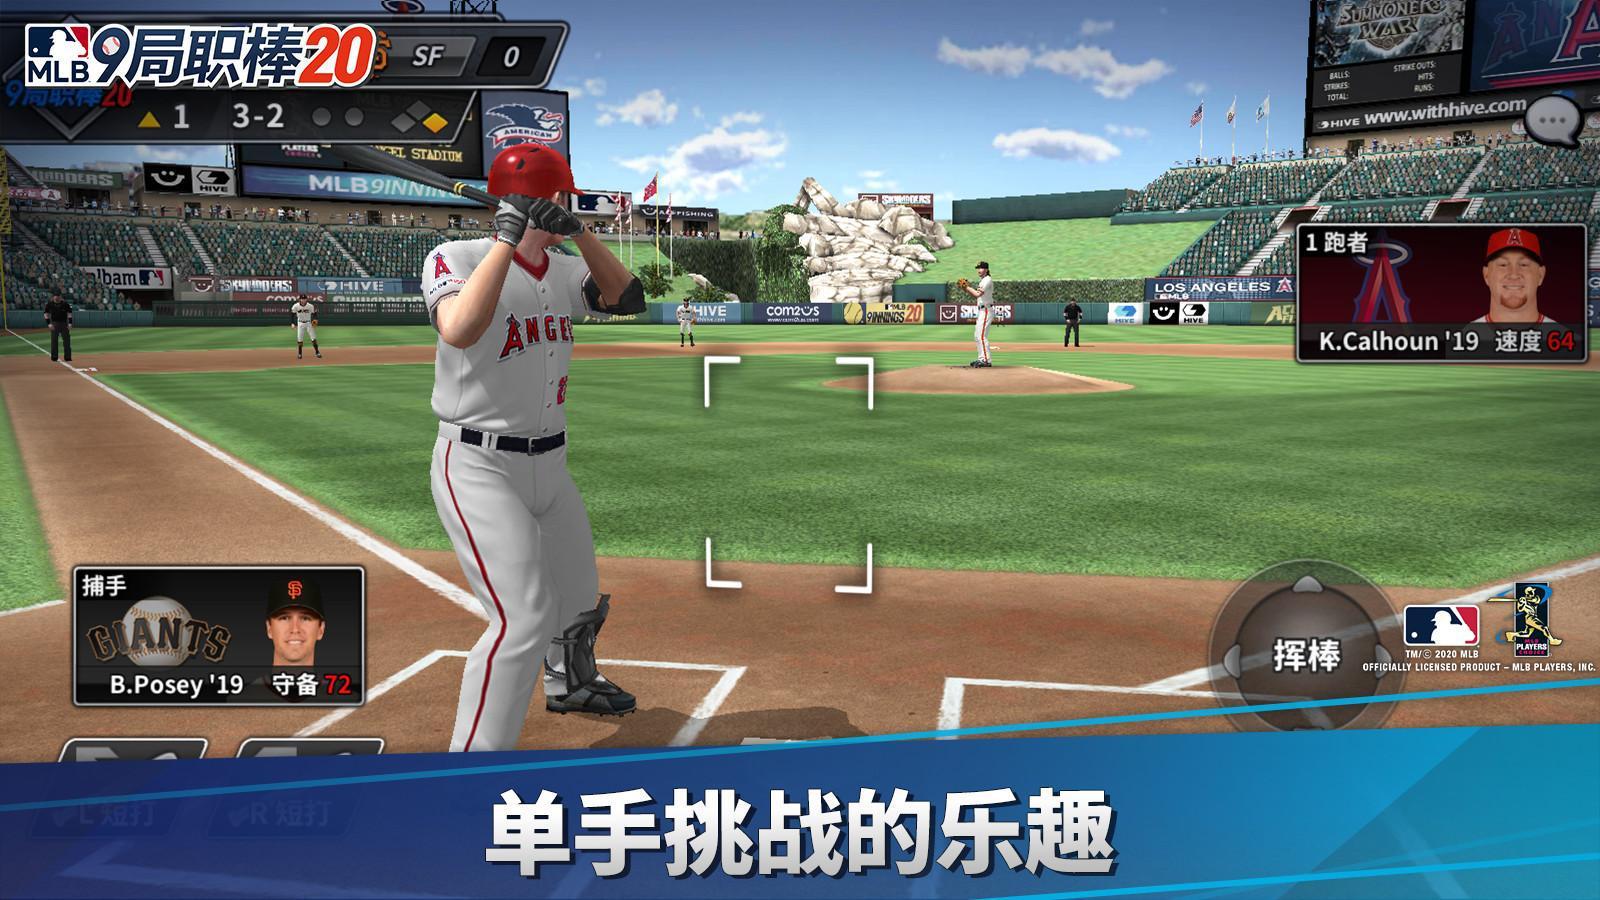 MLB:9局职棒19 游戏截图4